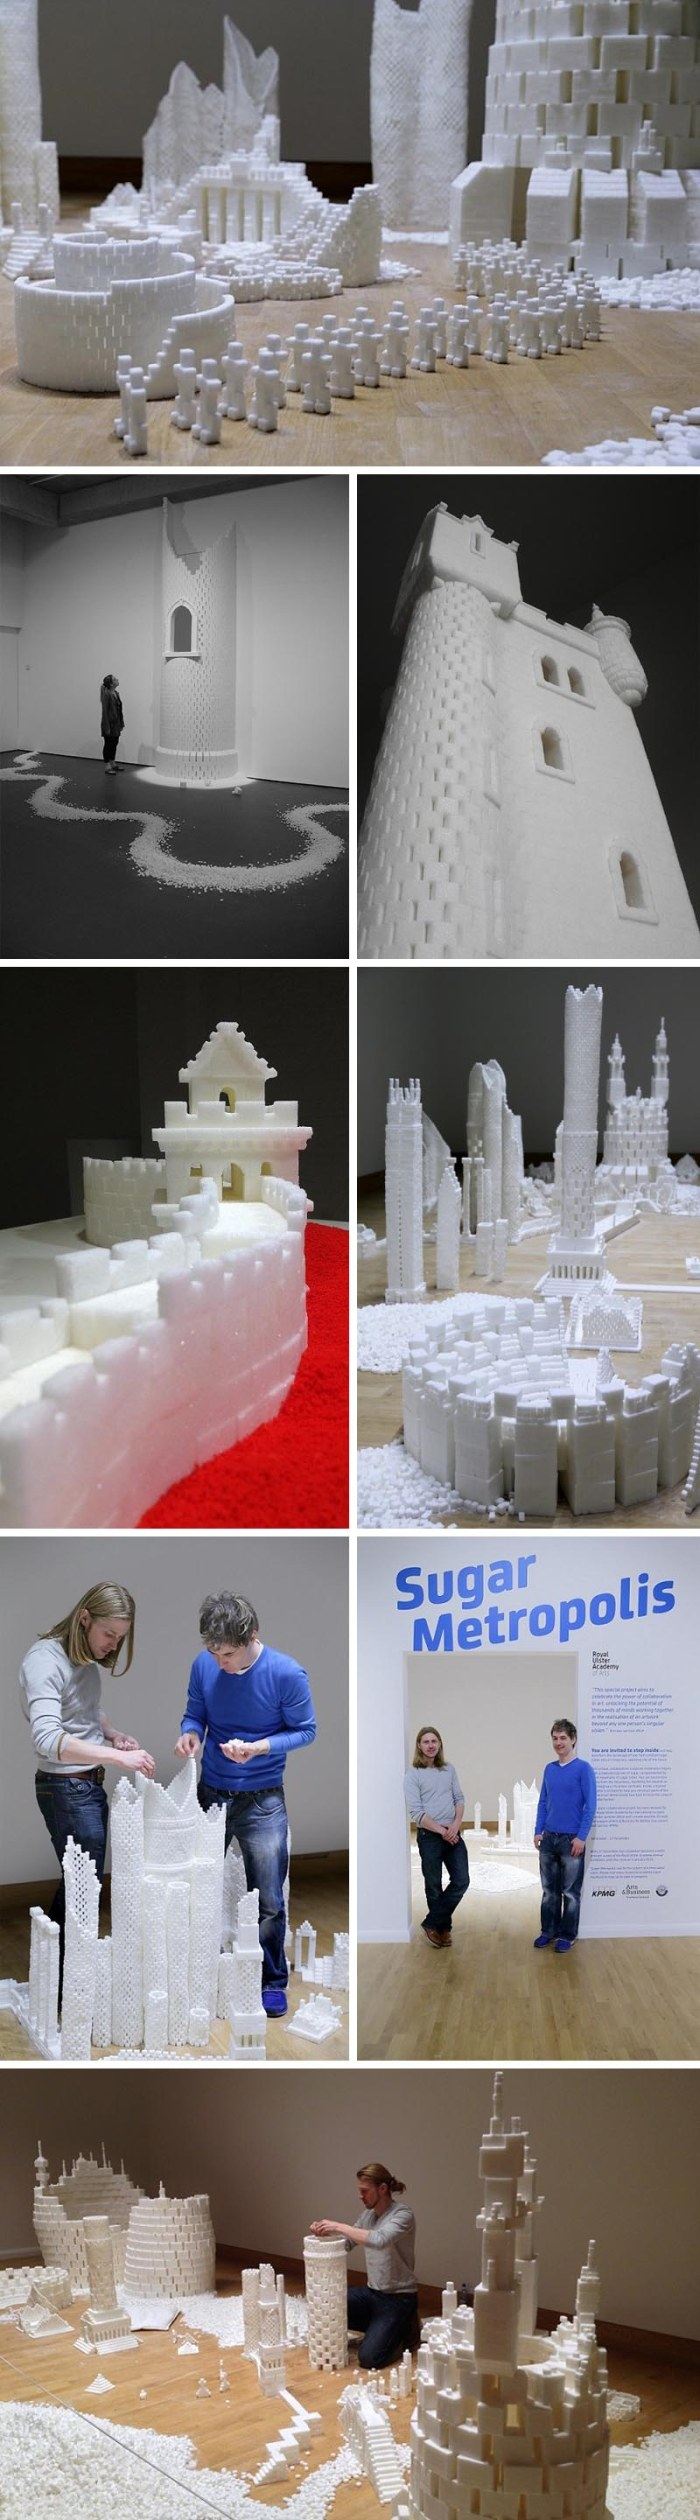 Sugar Metropolis project for kids in Harlem, Summer 2014, Brendan Jamison and Mark Revels, community art, sugar cube art